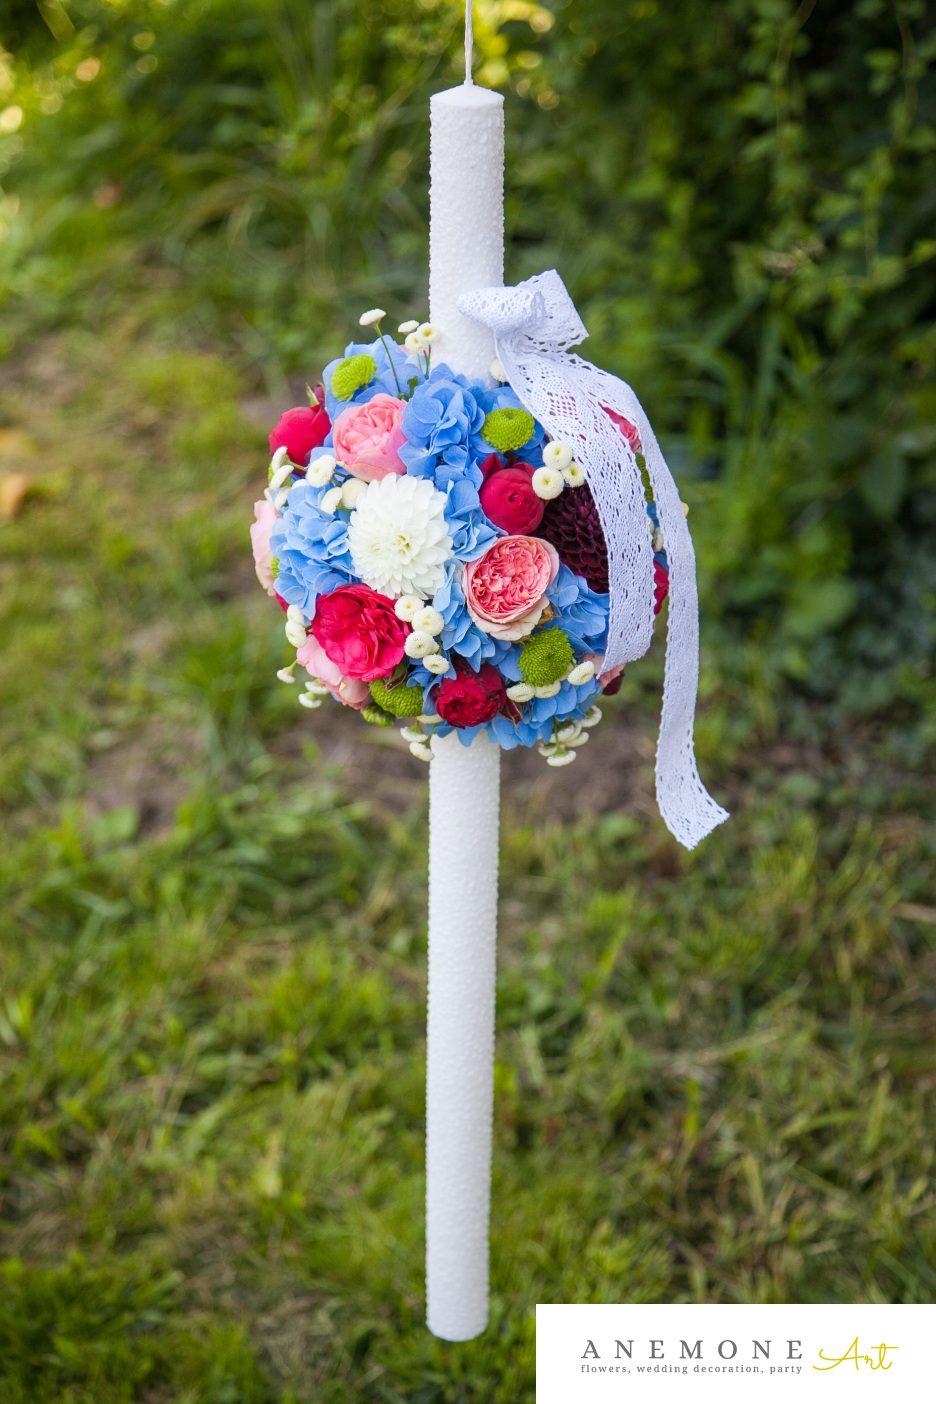 Poza, foto cu Flori de nunta glob, lumanare cununie, multicolor in Arad, Timisoara, Oradea (wedding flowers, bouquets) nunta Arad, Timisoara, Oradea